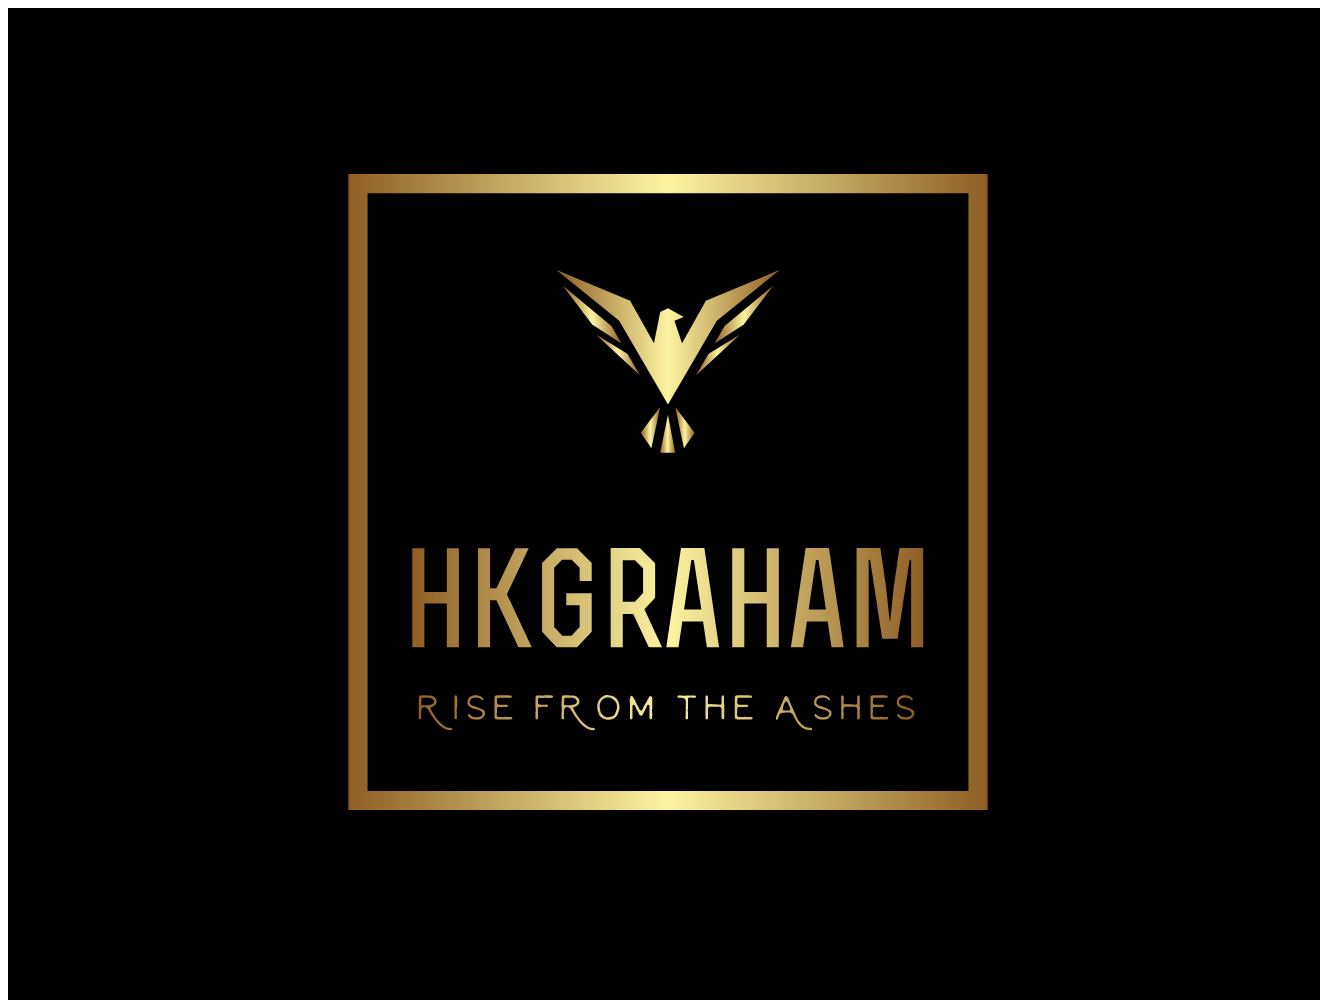 hkgraham